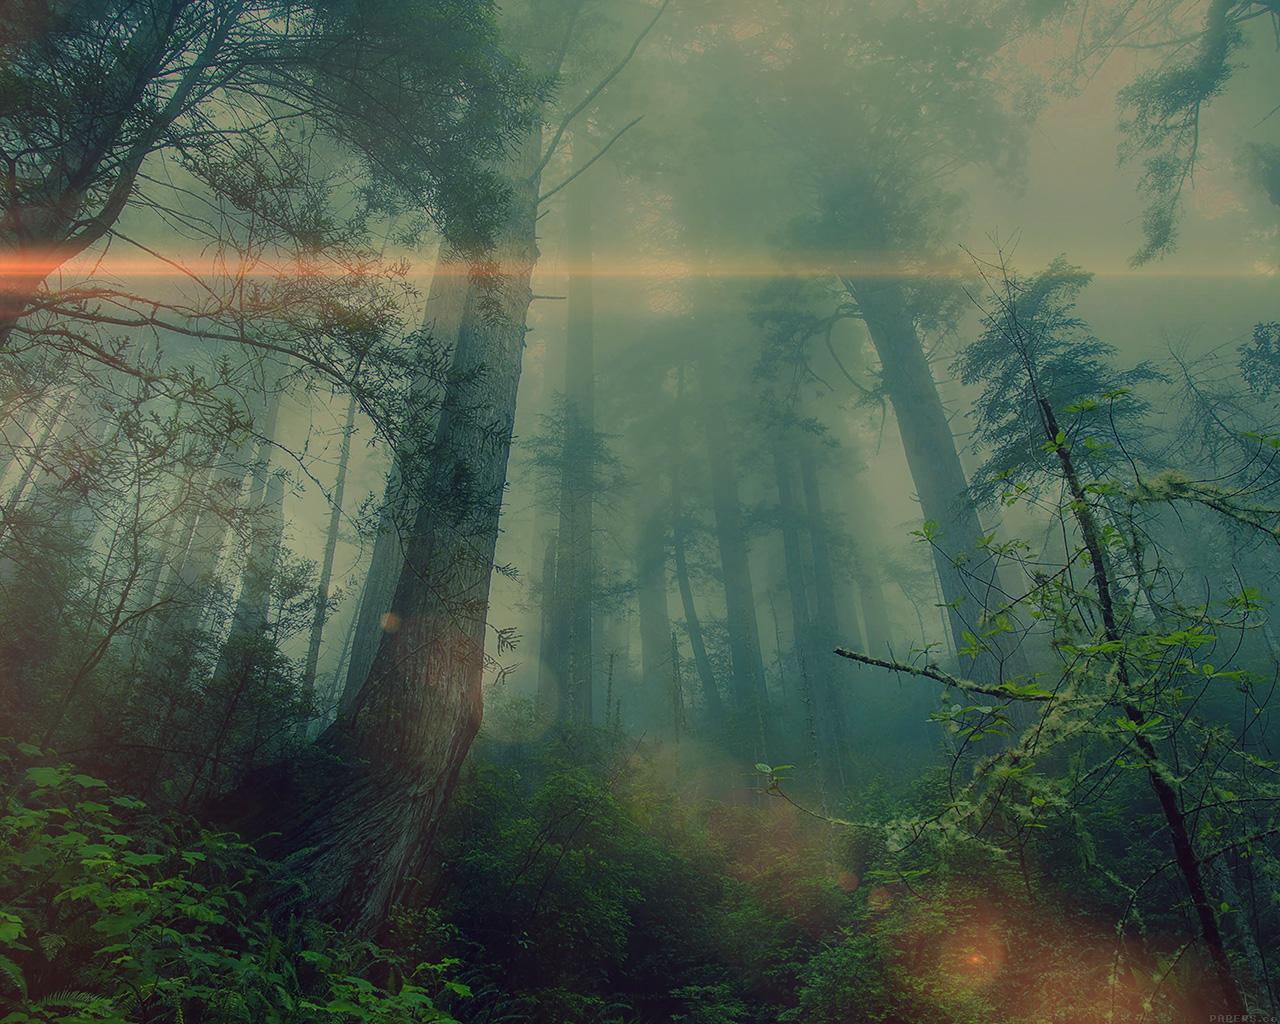 wallpaper for desktop, laptop | mn32-forest-wood-fog-flare ...